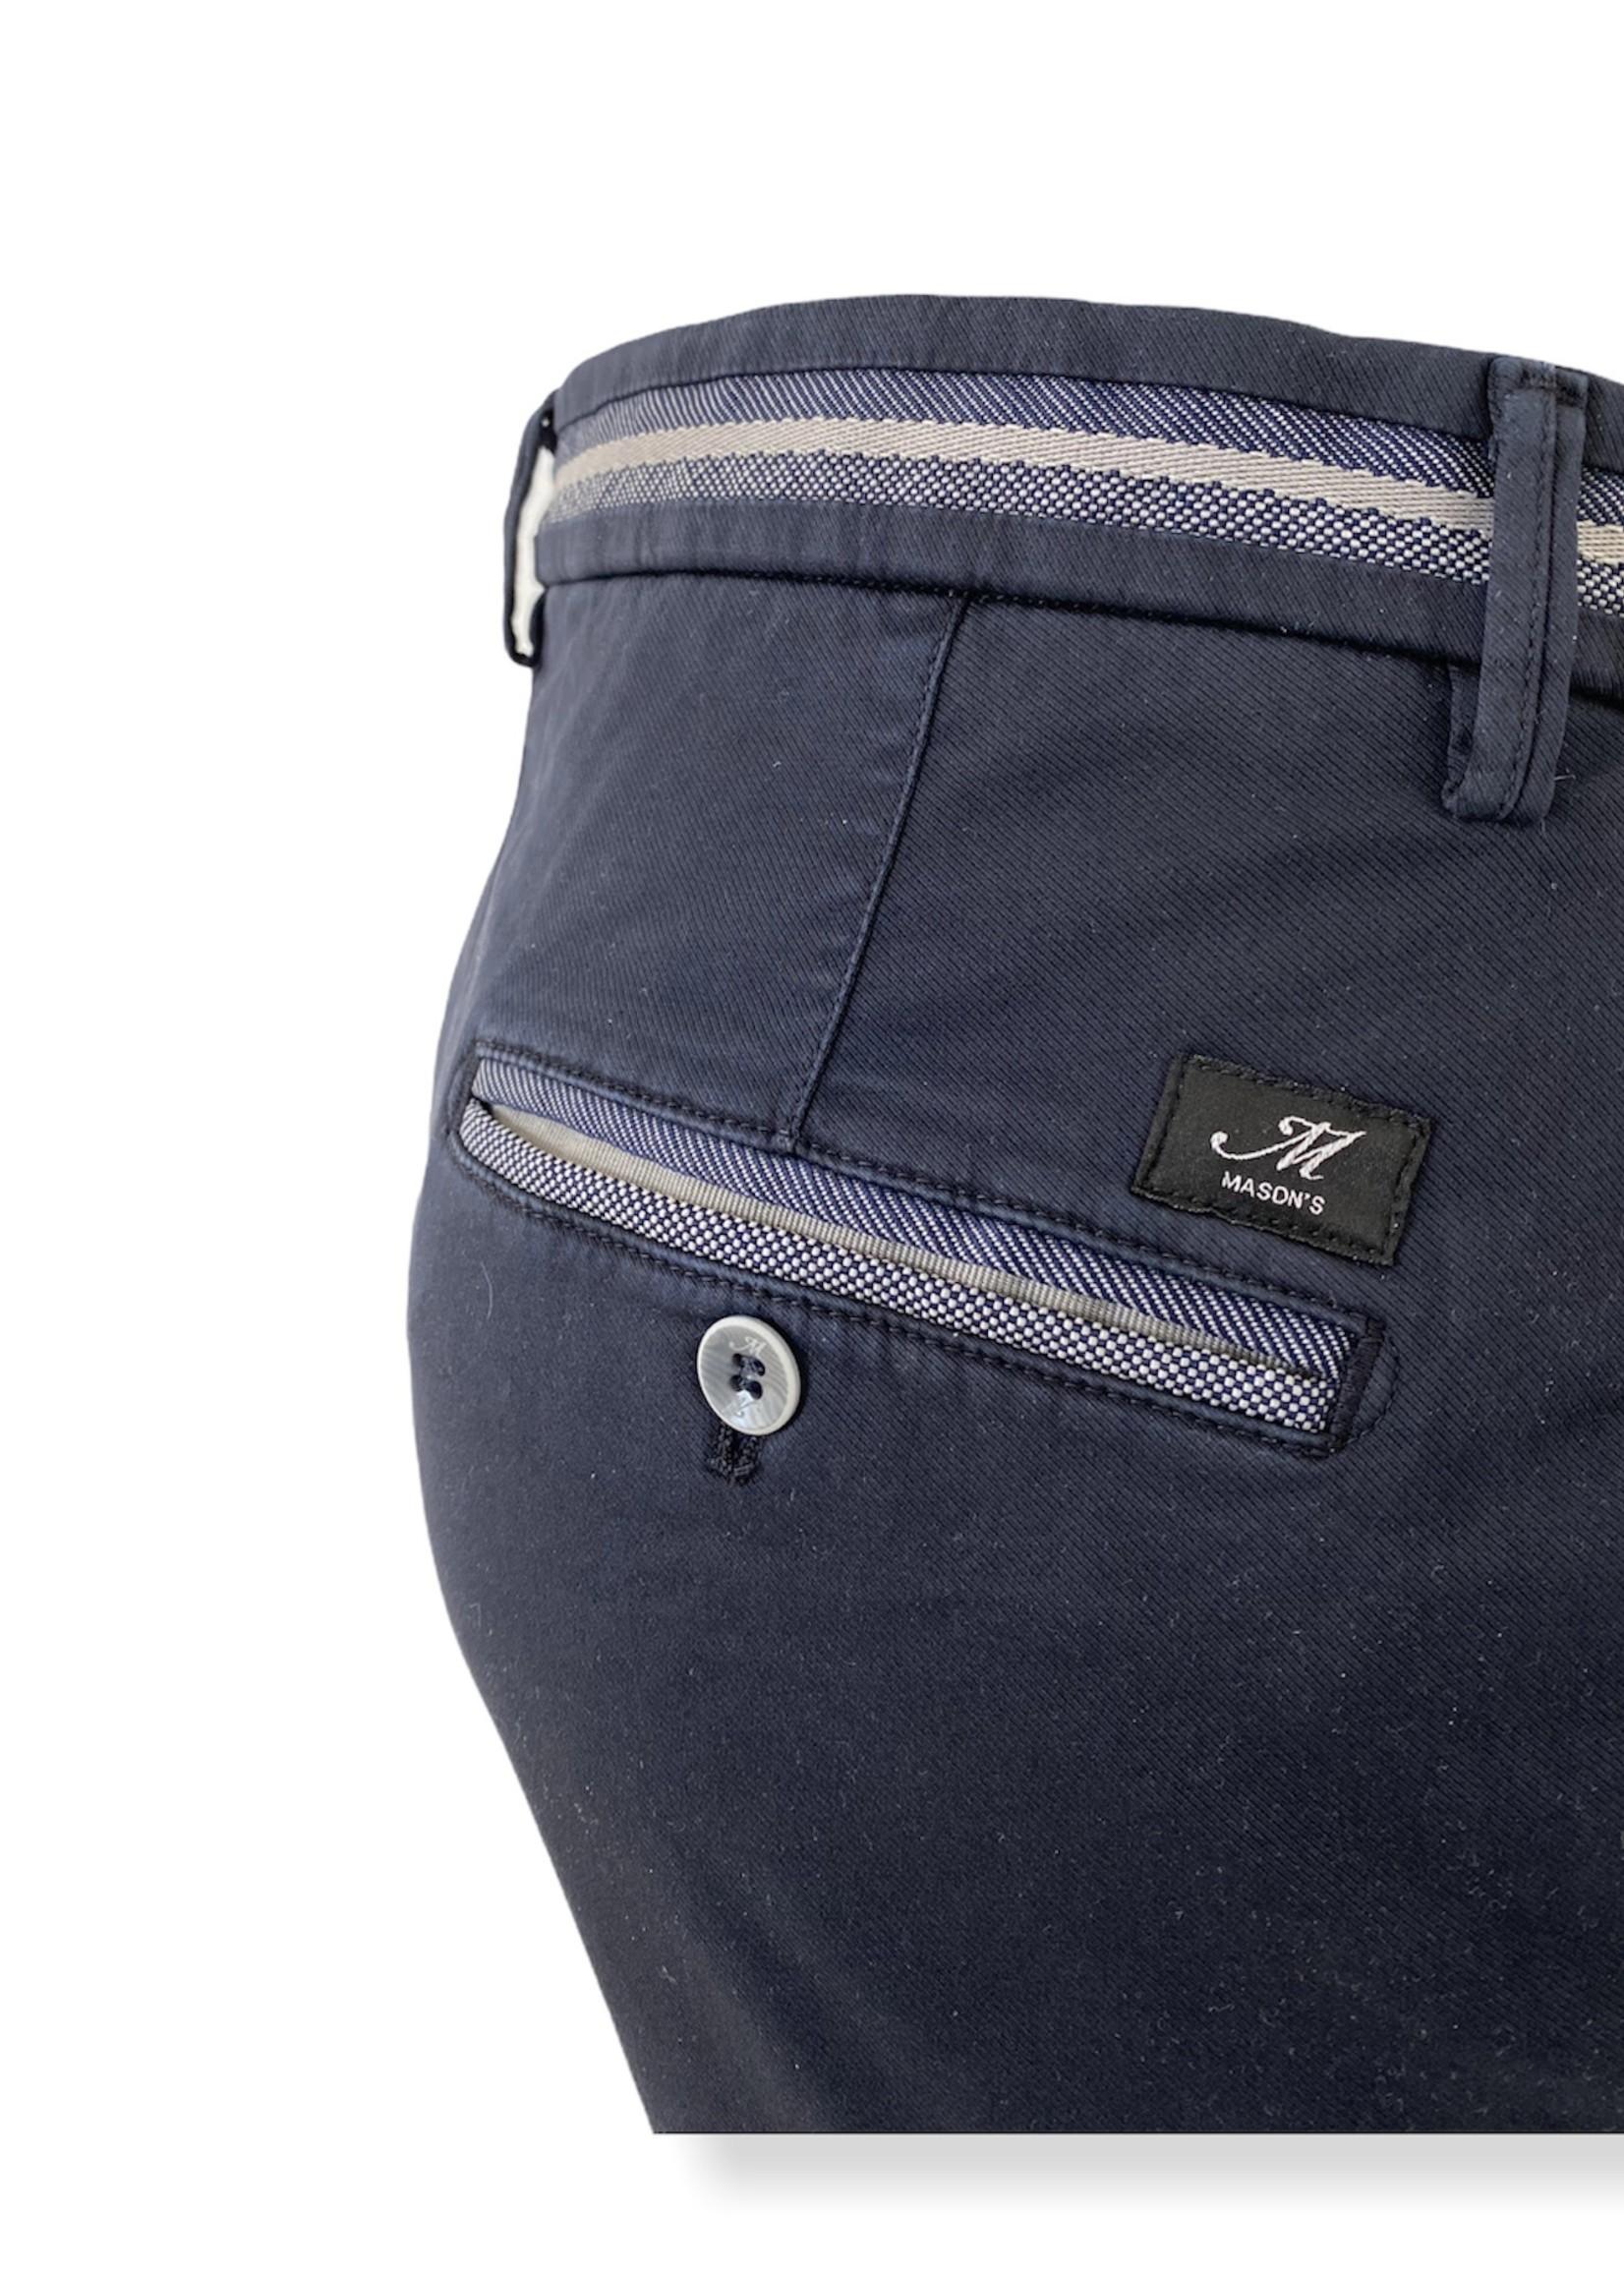 Mason's Torino Elegance Slim Fit Cotton Pants | Navy Blue | Mason's